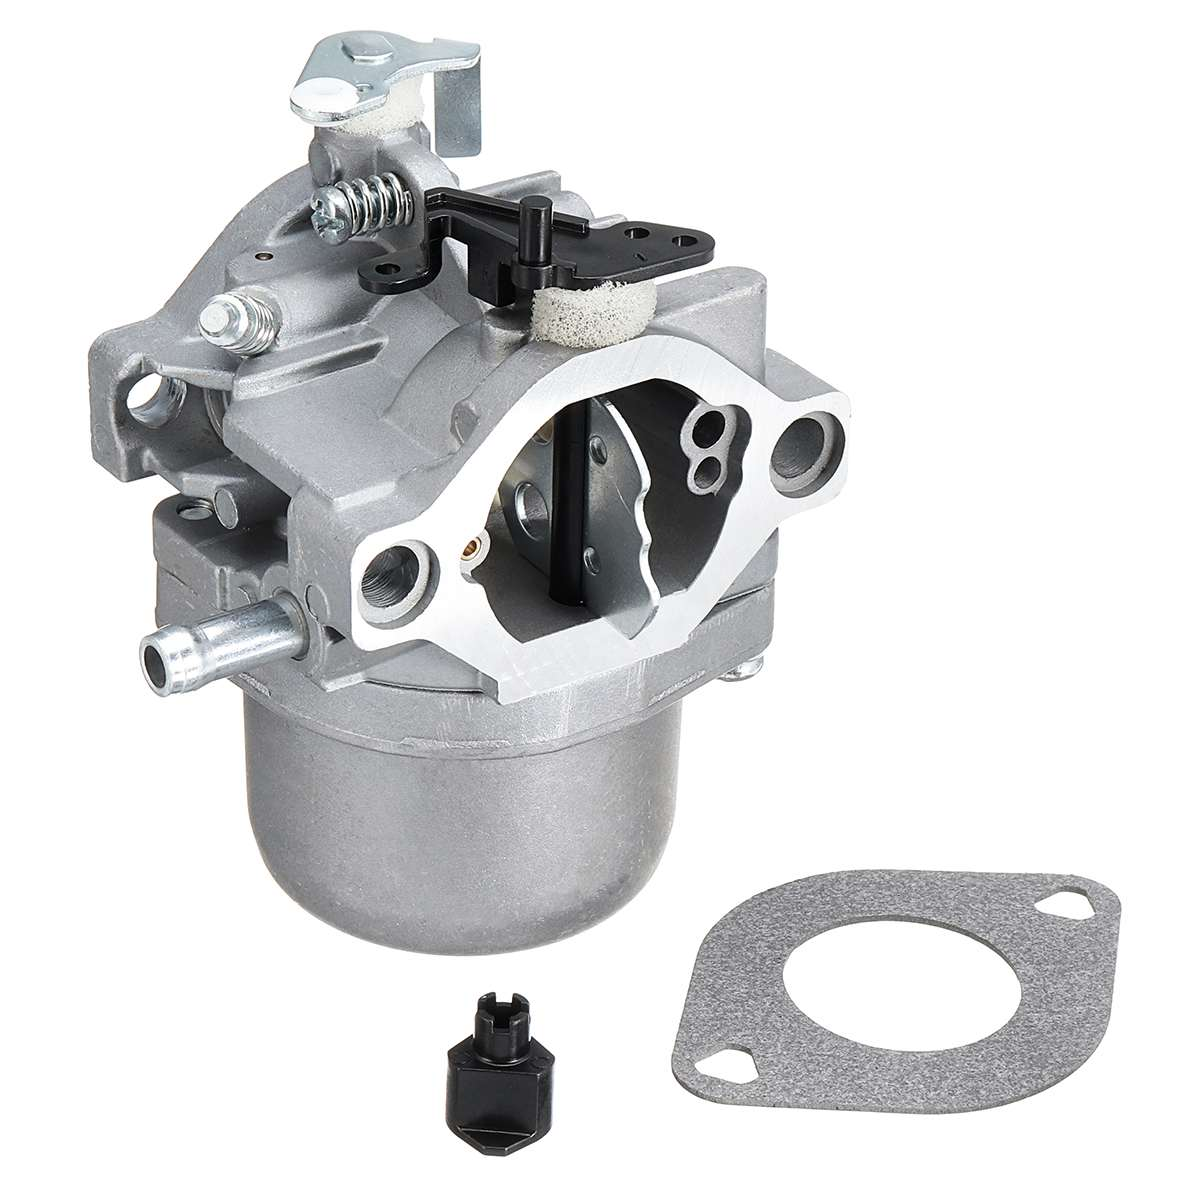 Carburetor Carb For Replaces Briggs & Stratton 799728 498231 499161 498027 Walbro LMT 5-4993 Carb Engine Motor Parts